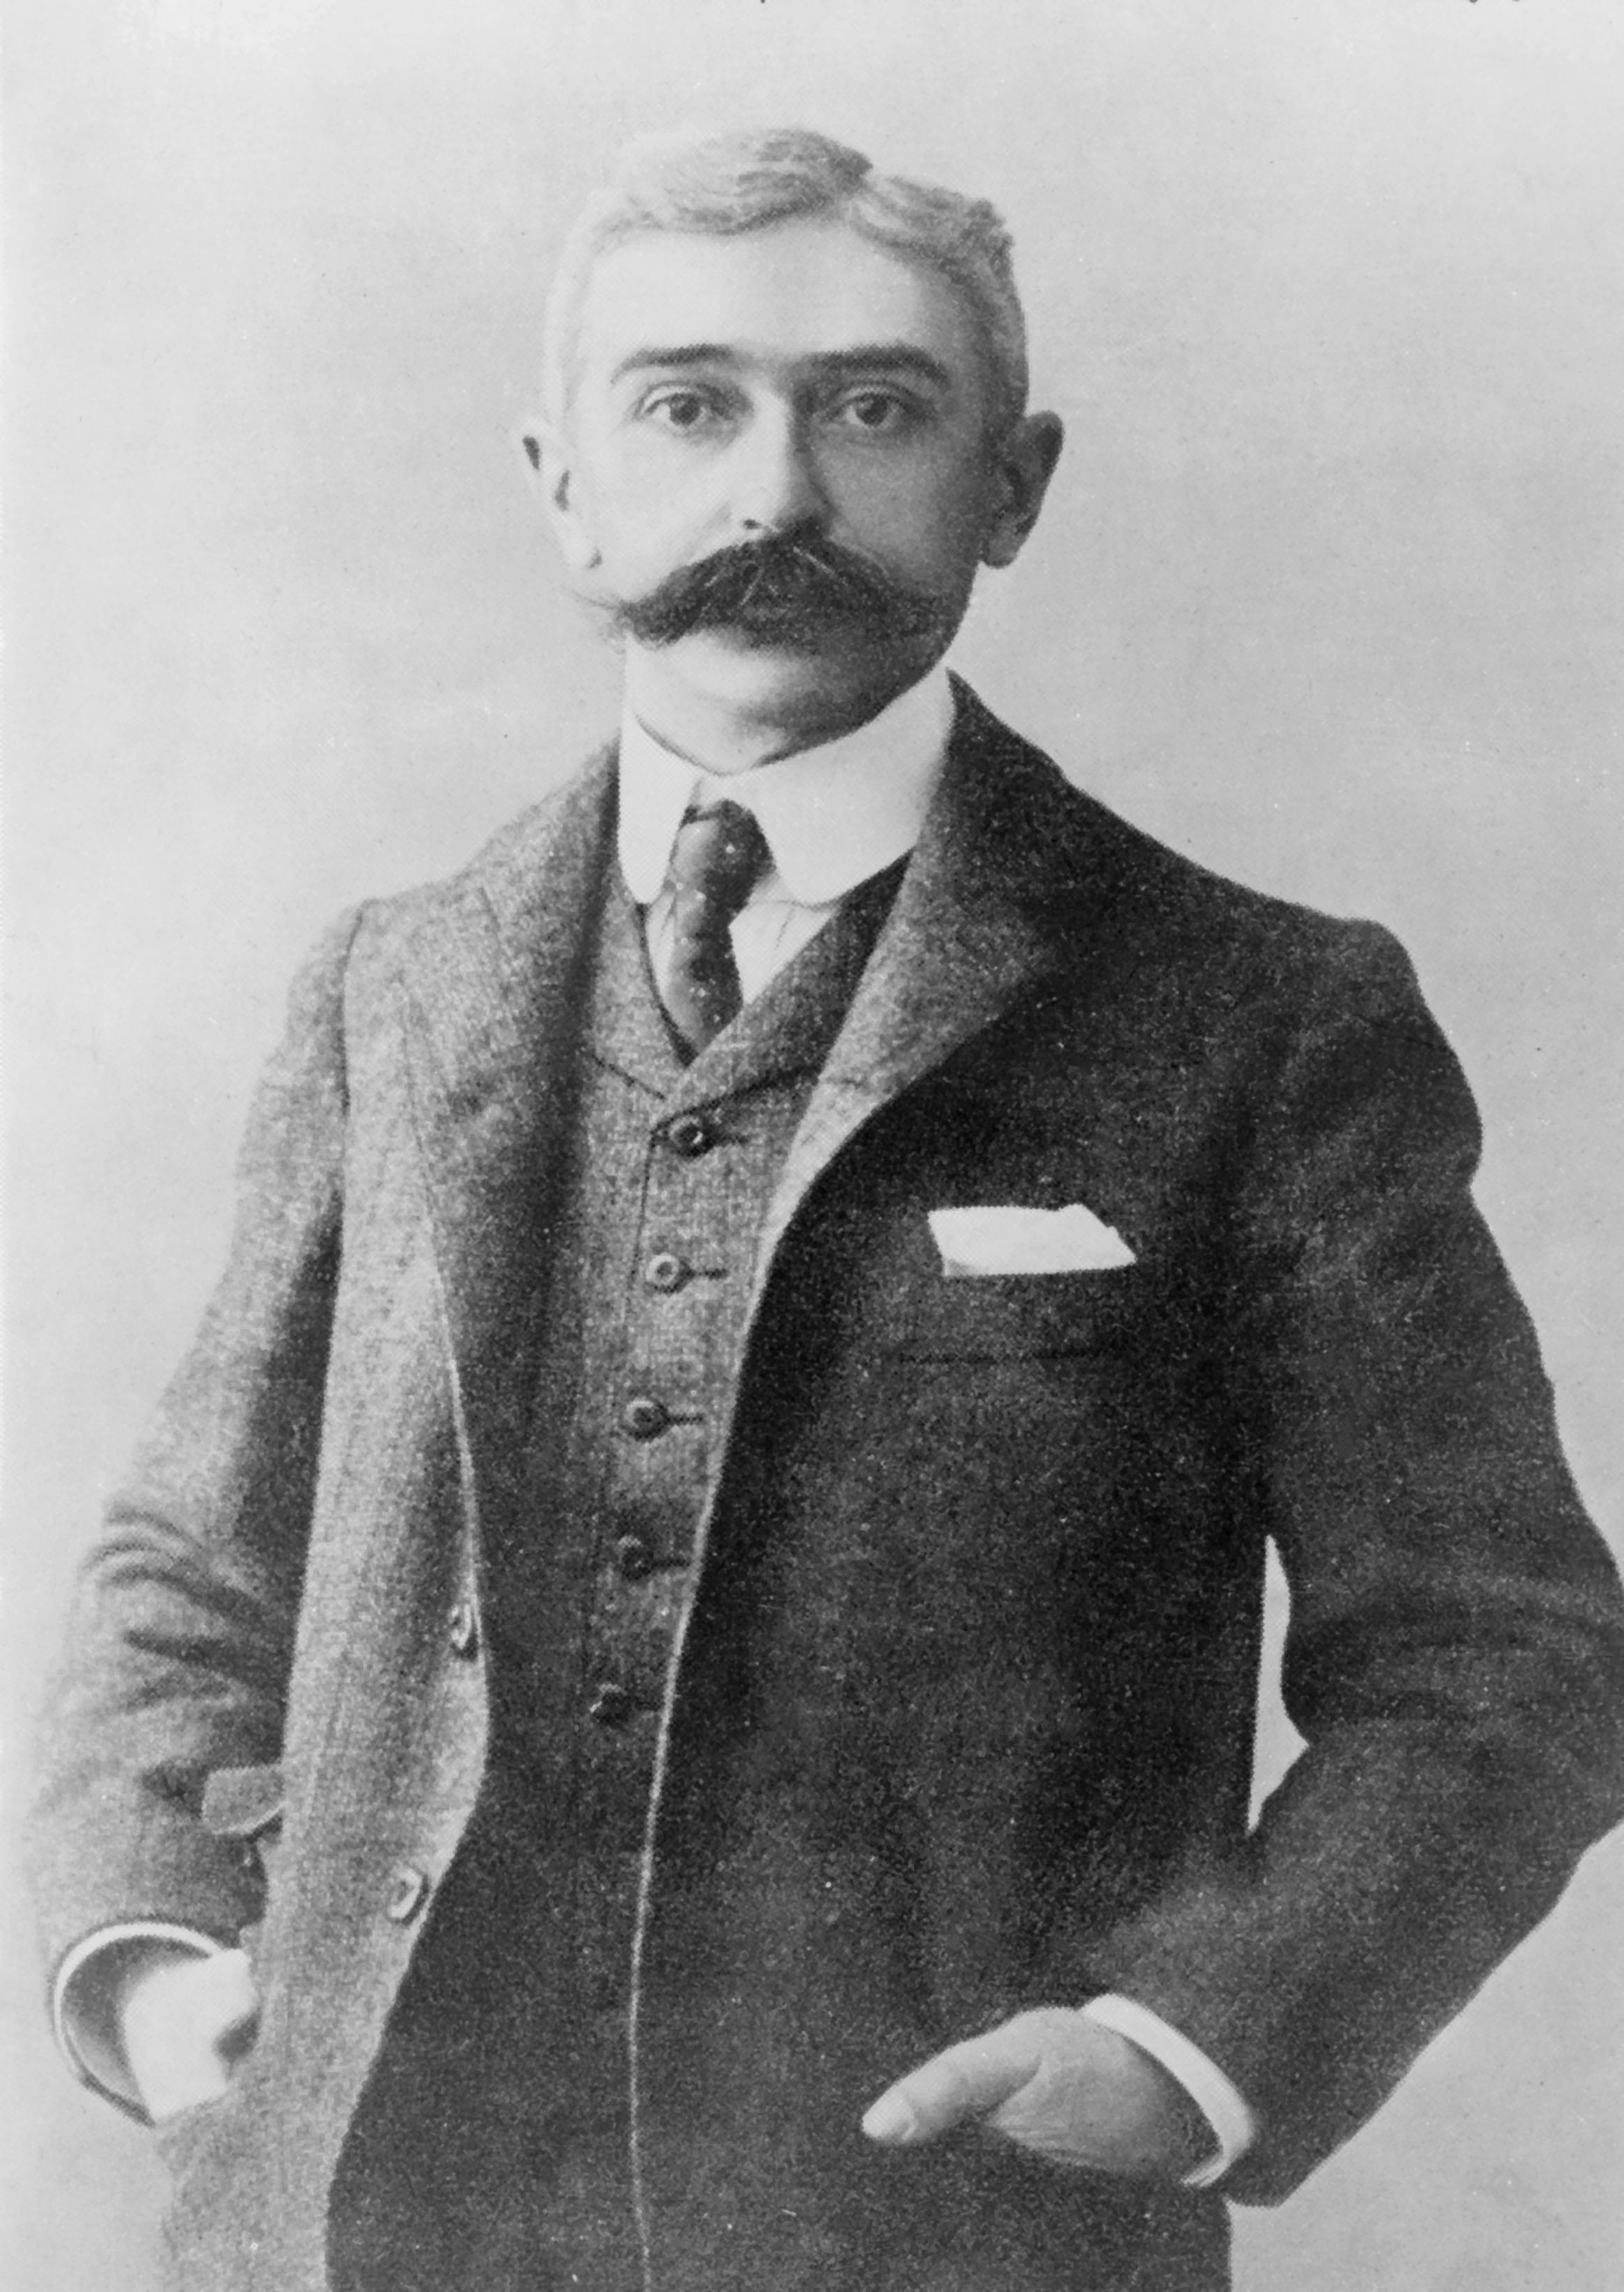 Depiction of Pierre de Coubertin